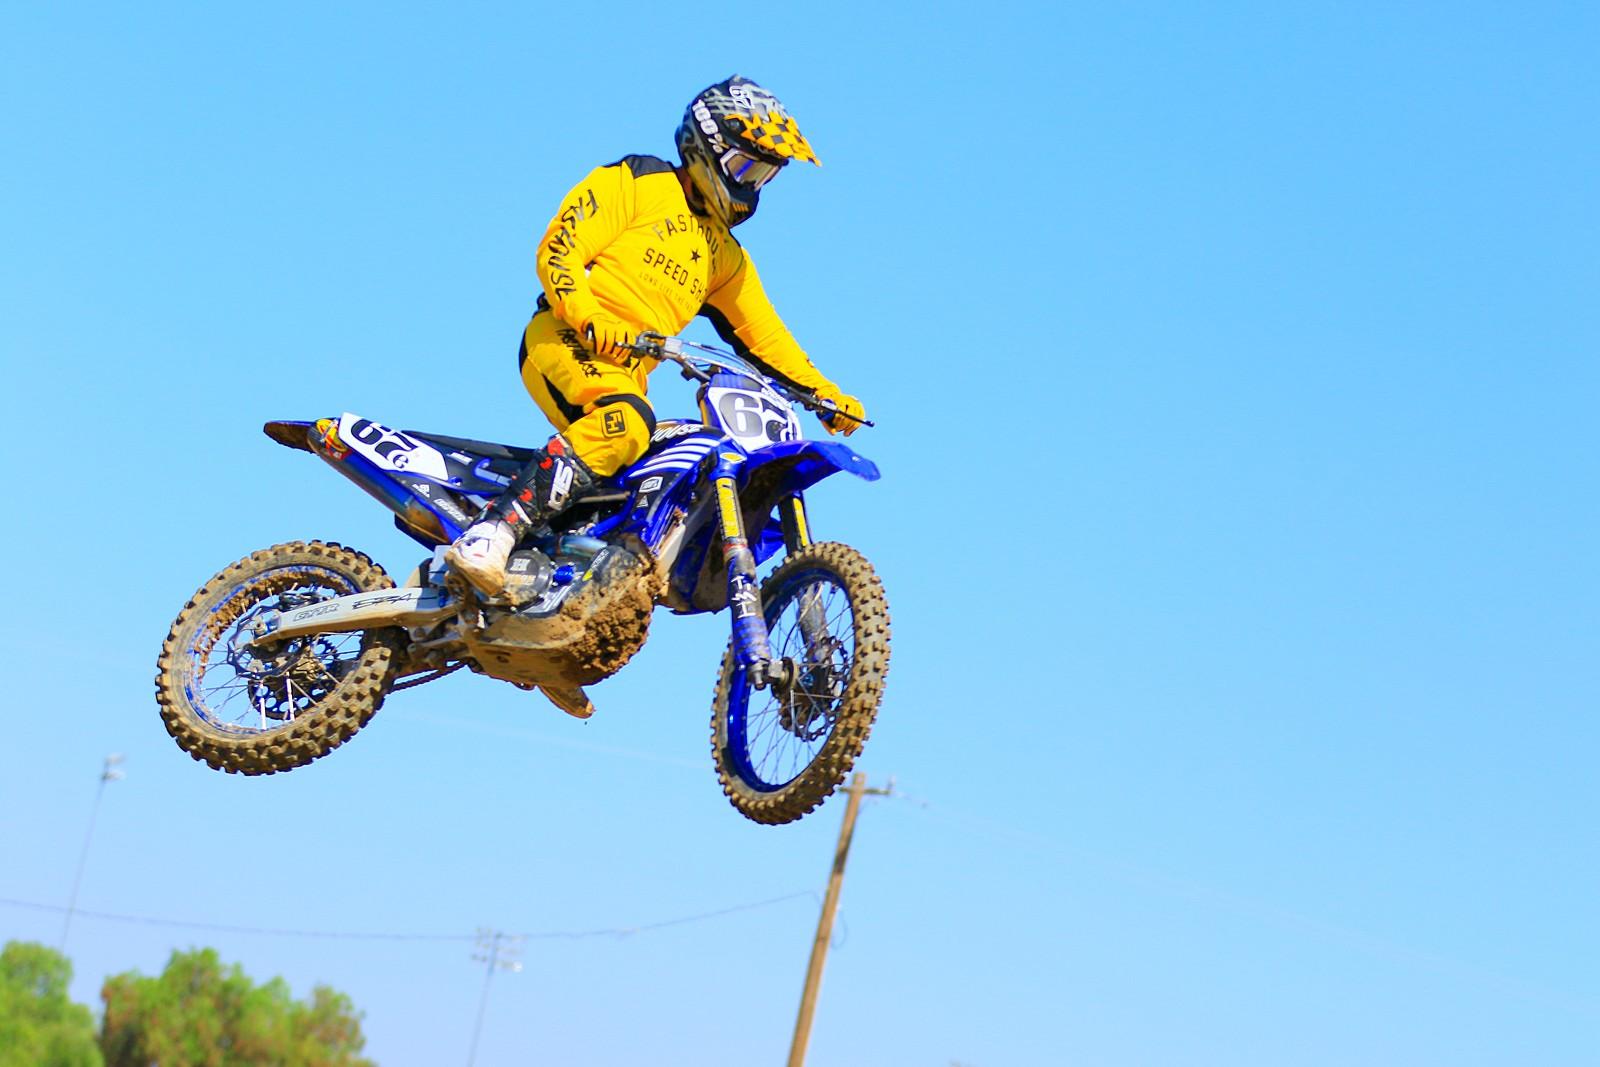 050A4922 - moto67e - Motocross Pictures - Vital MX